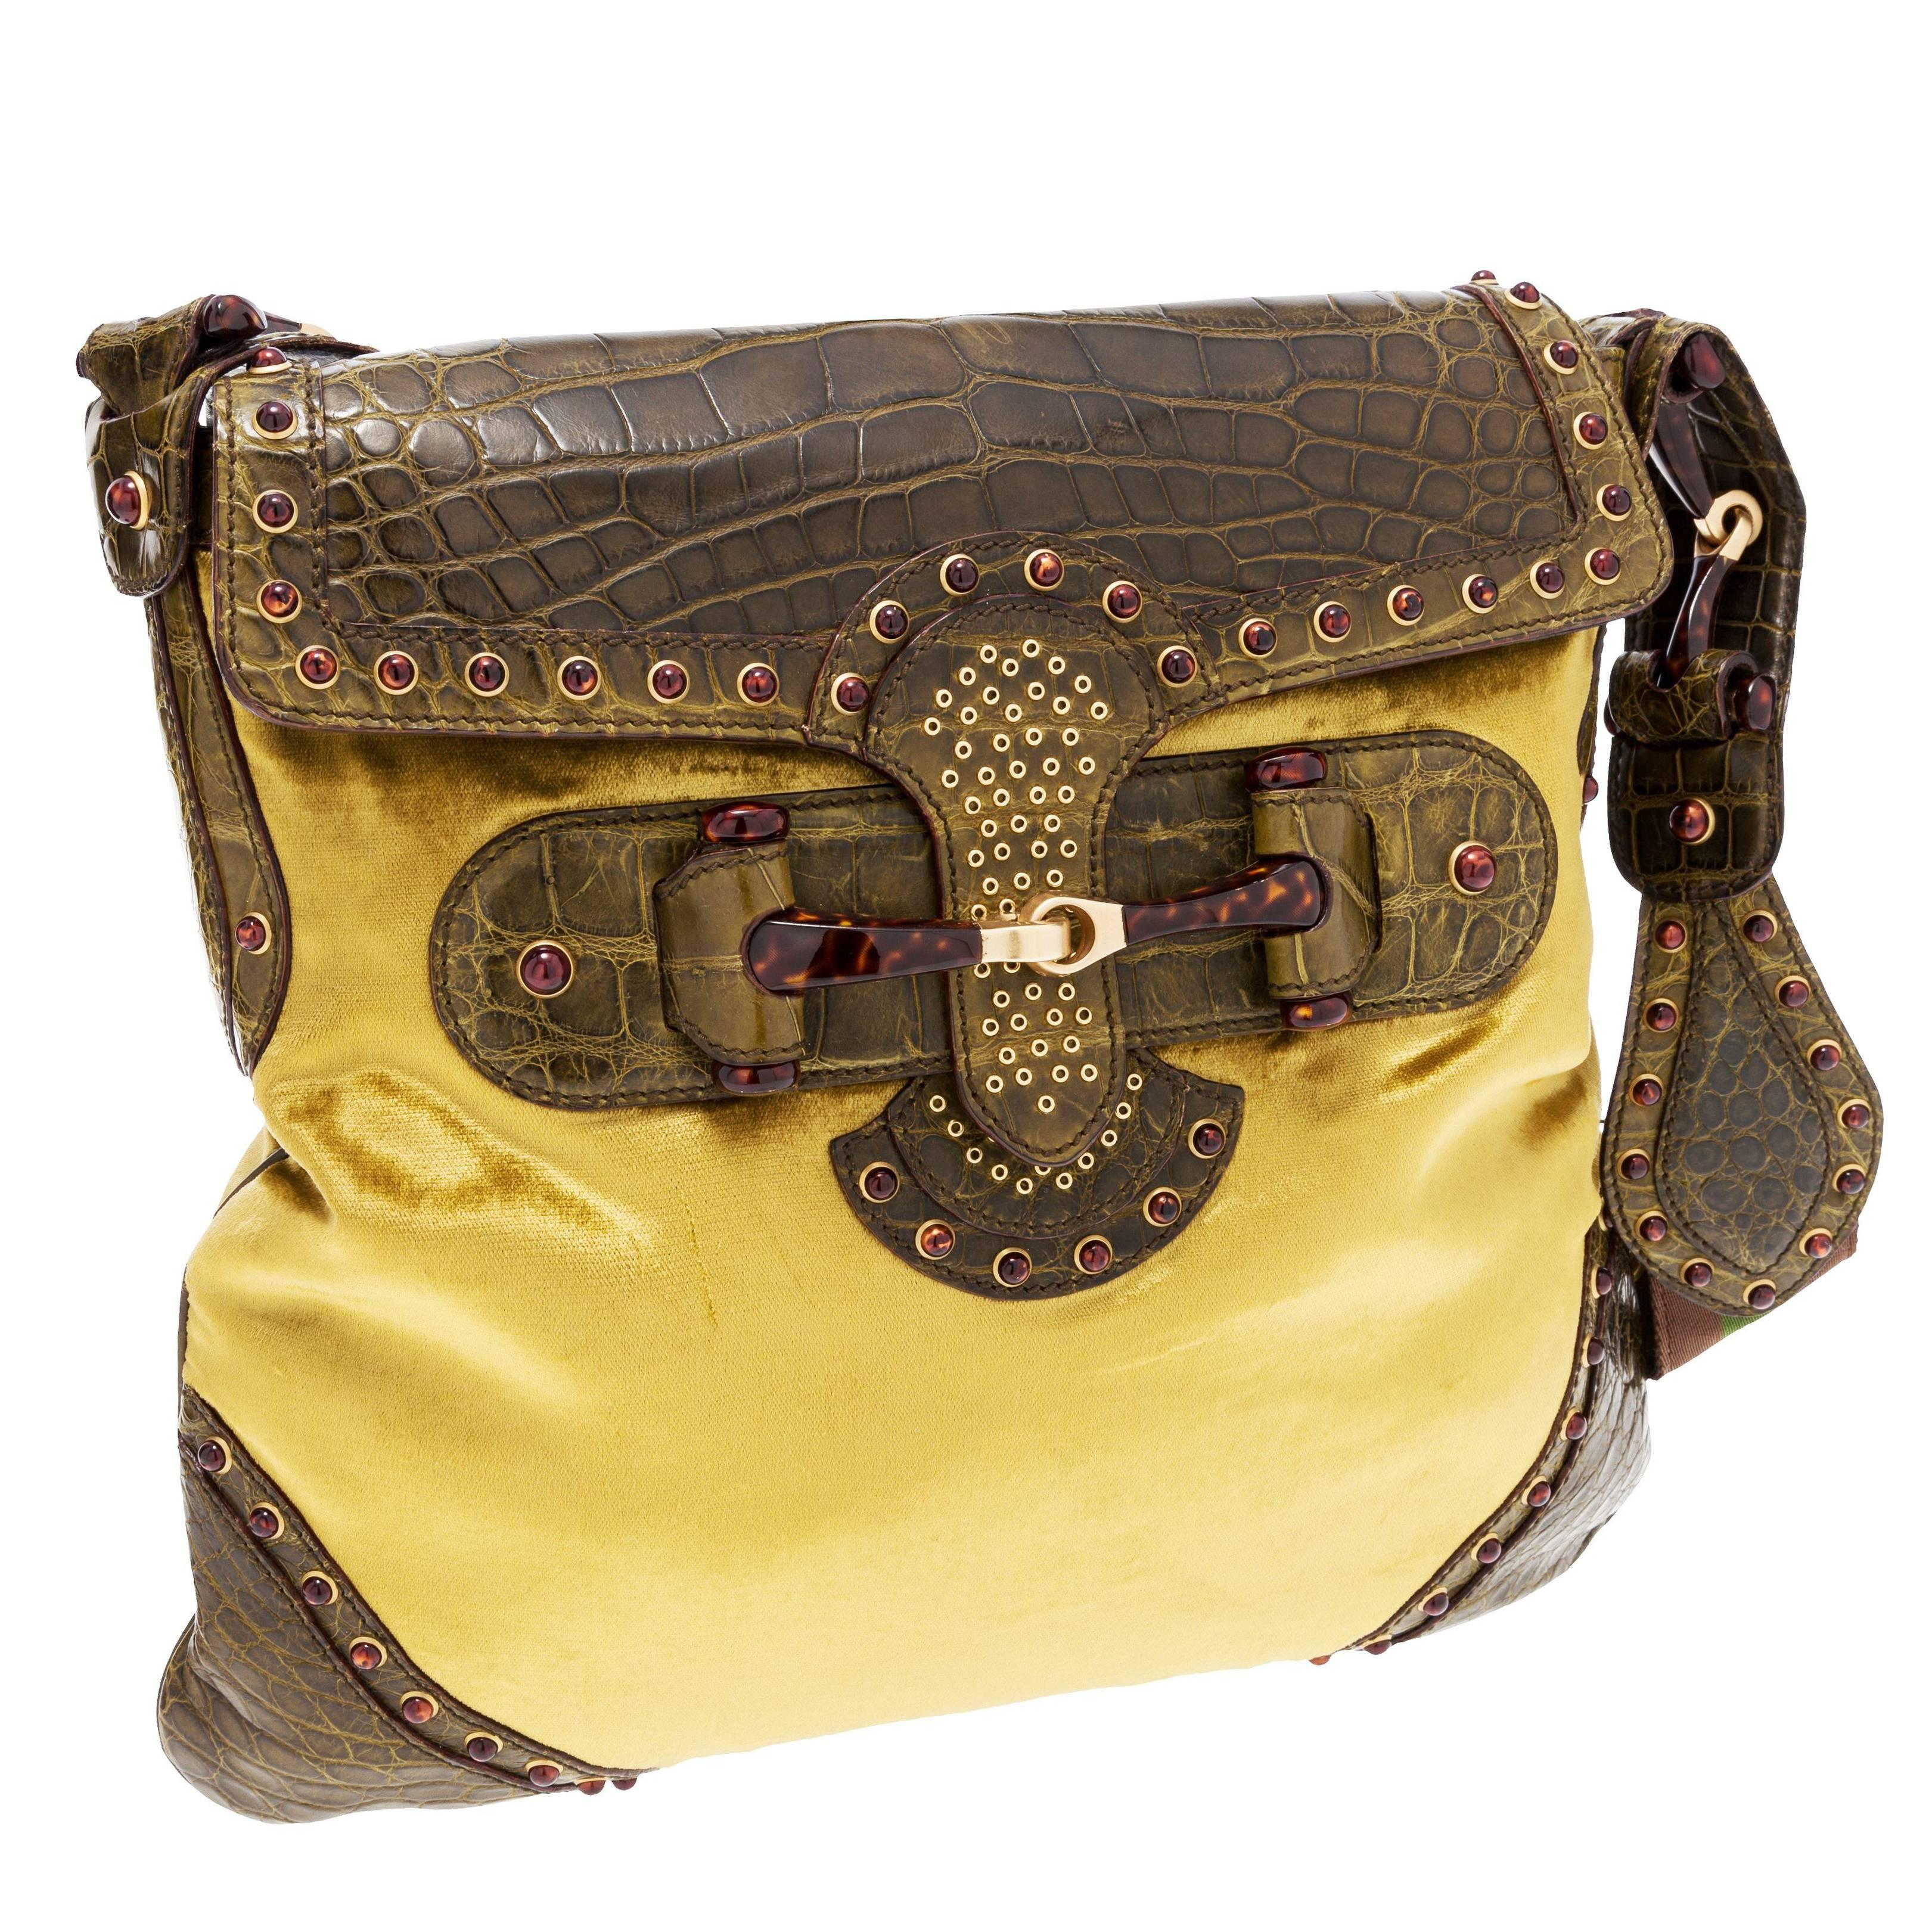 c611b68ab4ca58 Gucci Tom Ford Green Crocodile and Velvet Horsebit Shoulder Bag For Sale at  1stdibs